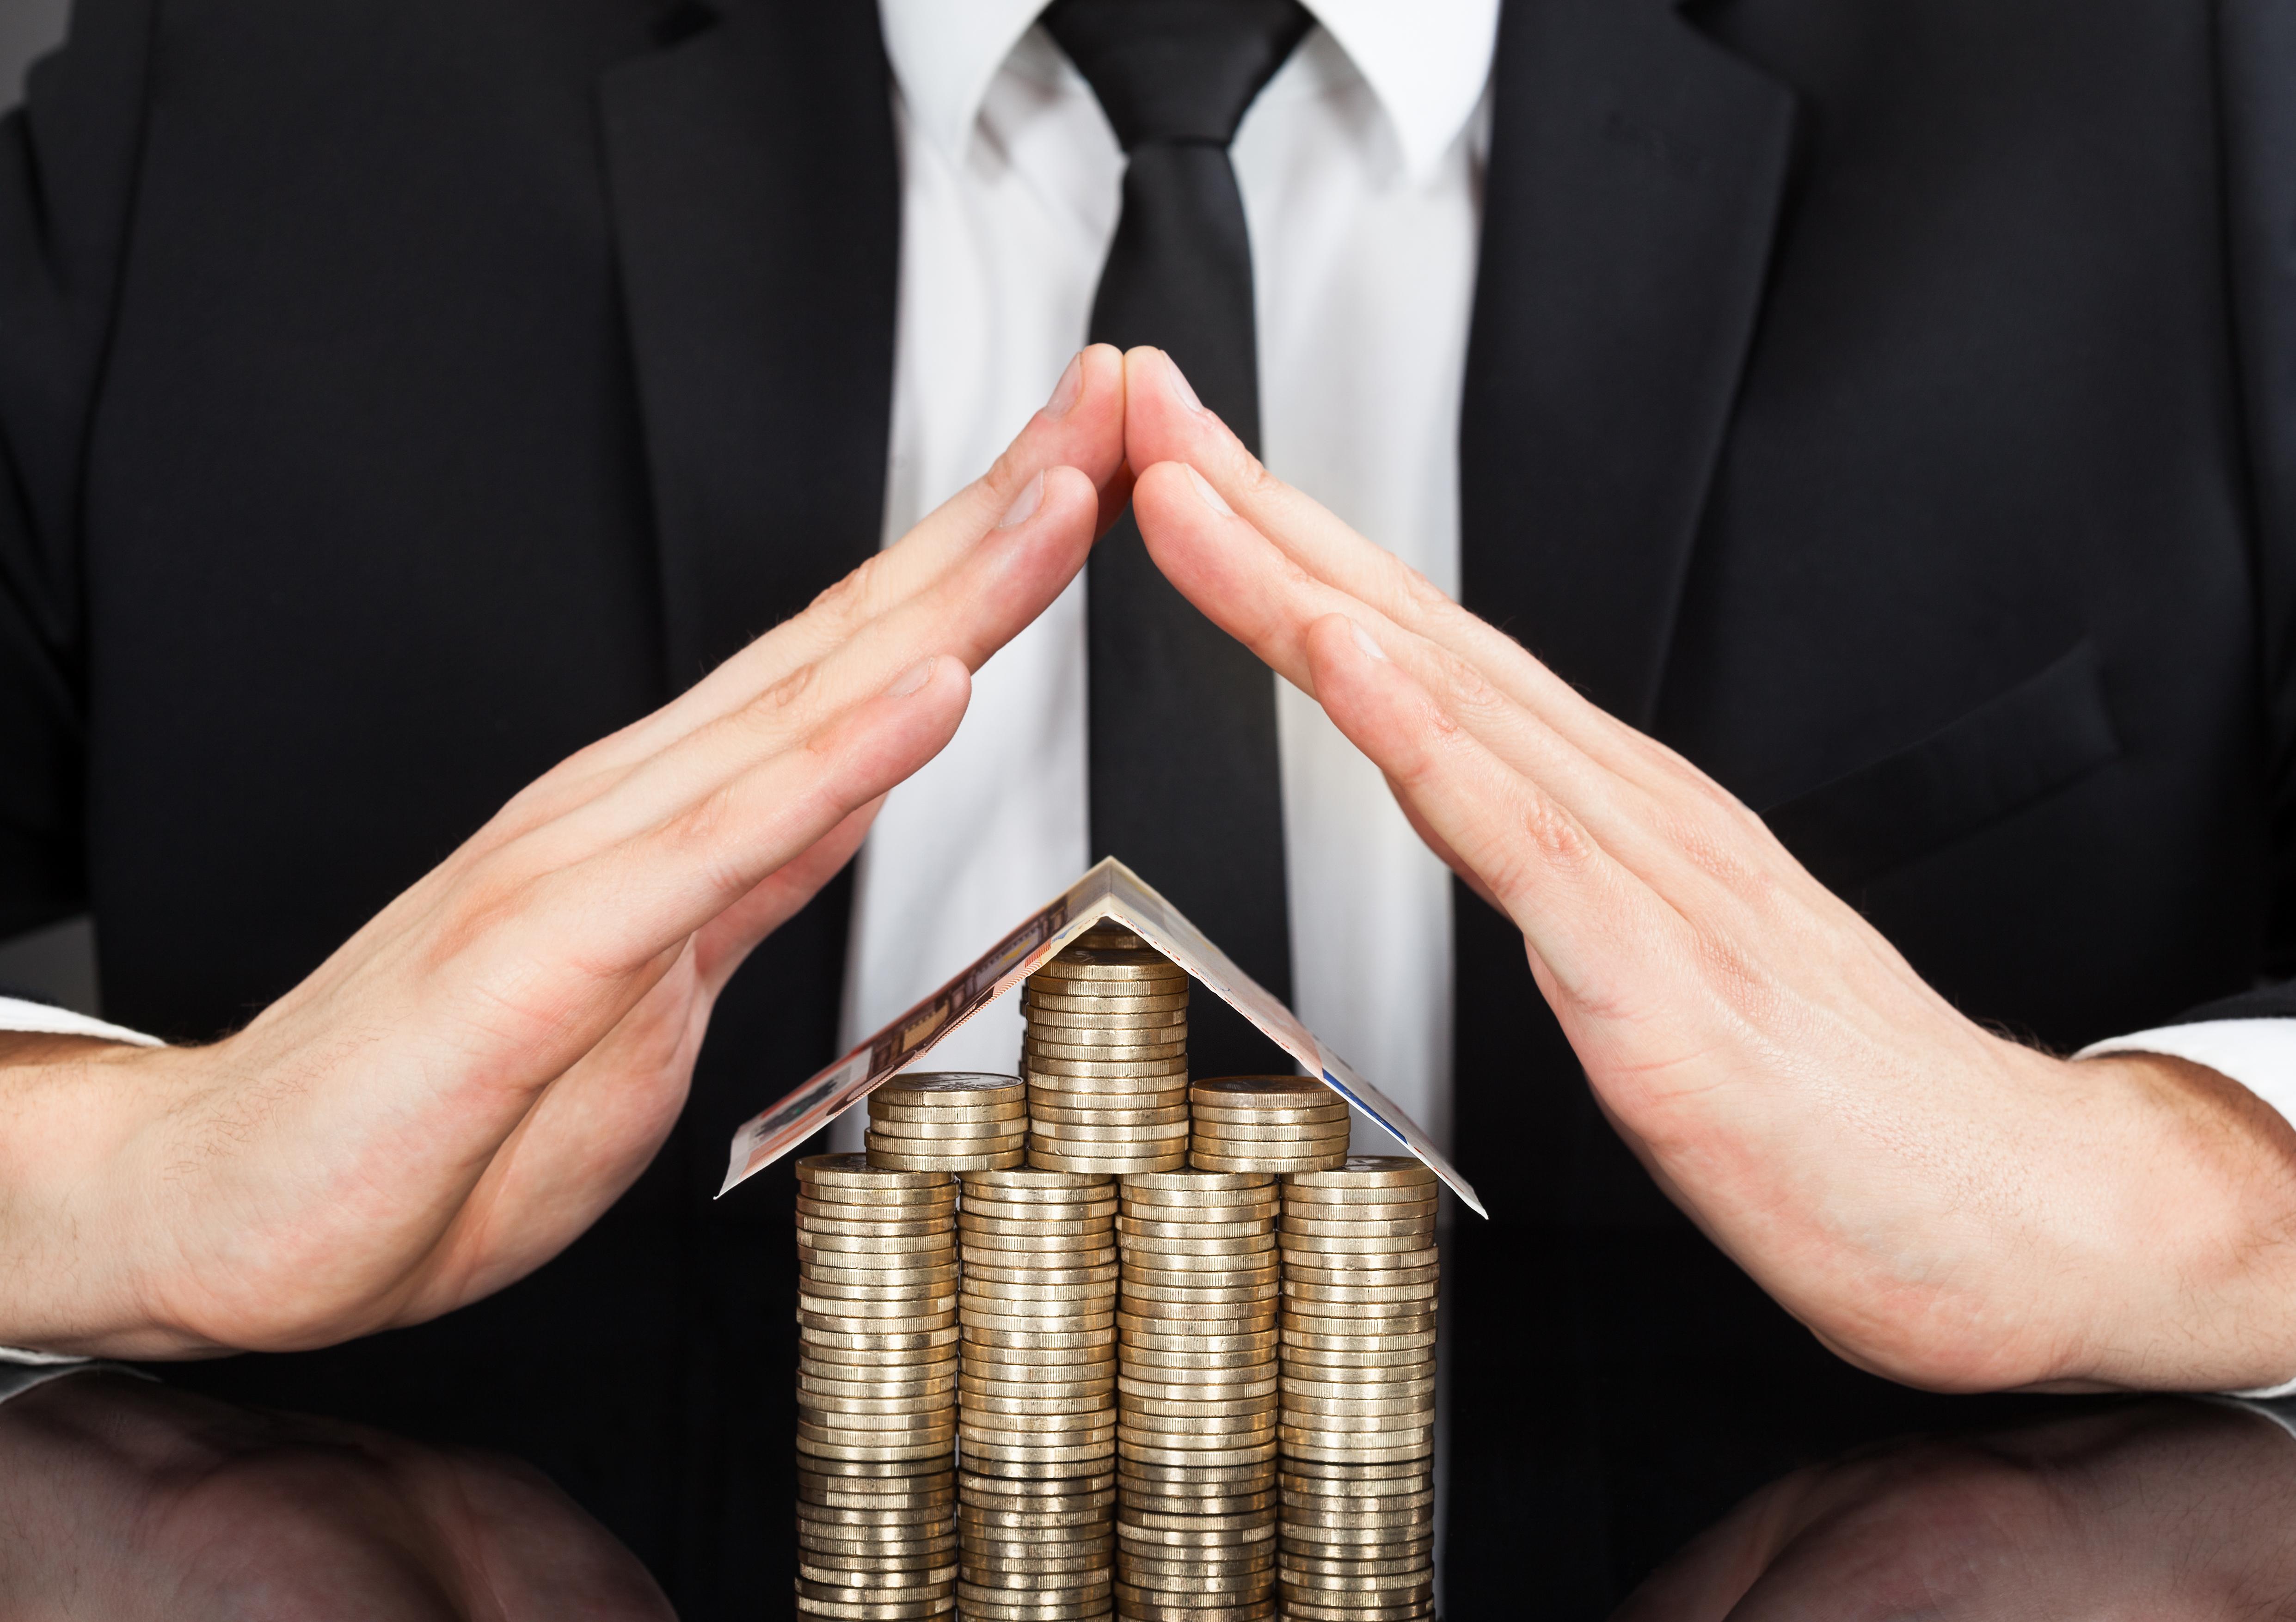 Ristrutturazione casa incentivi 2018 detrazioni fiscali for Incentivi ristrutturazione casa 2017